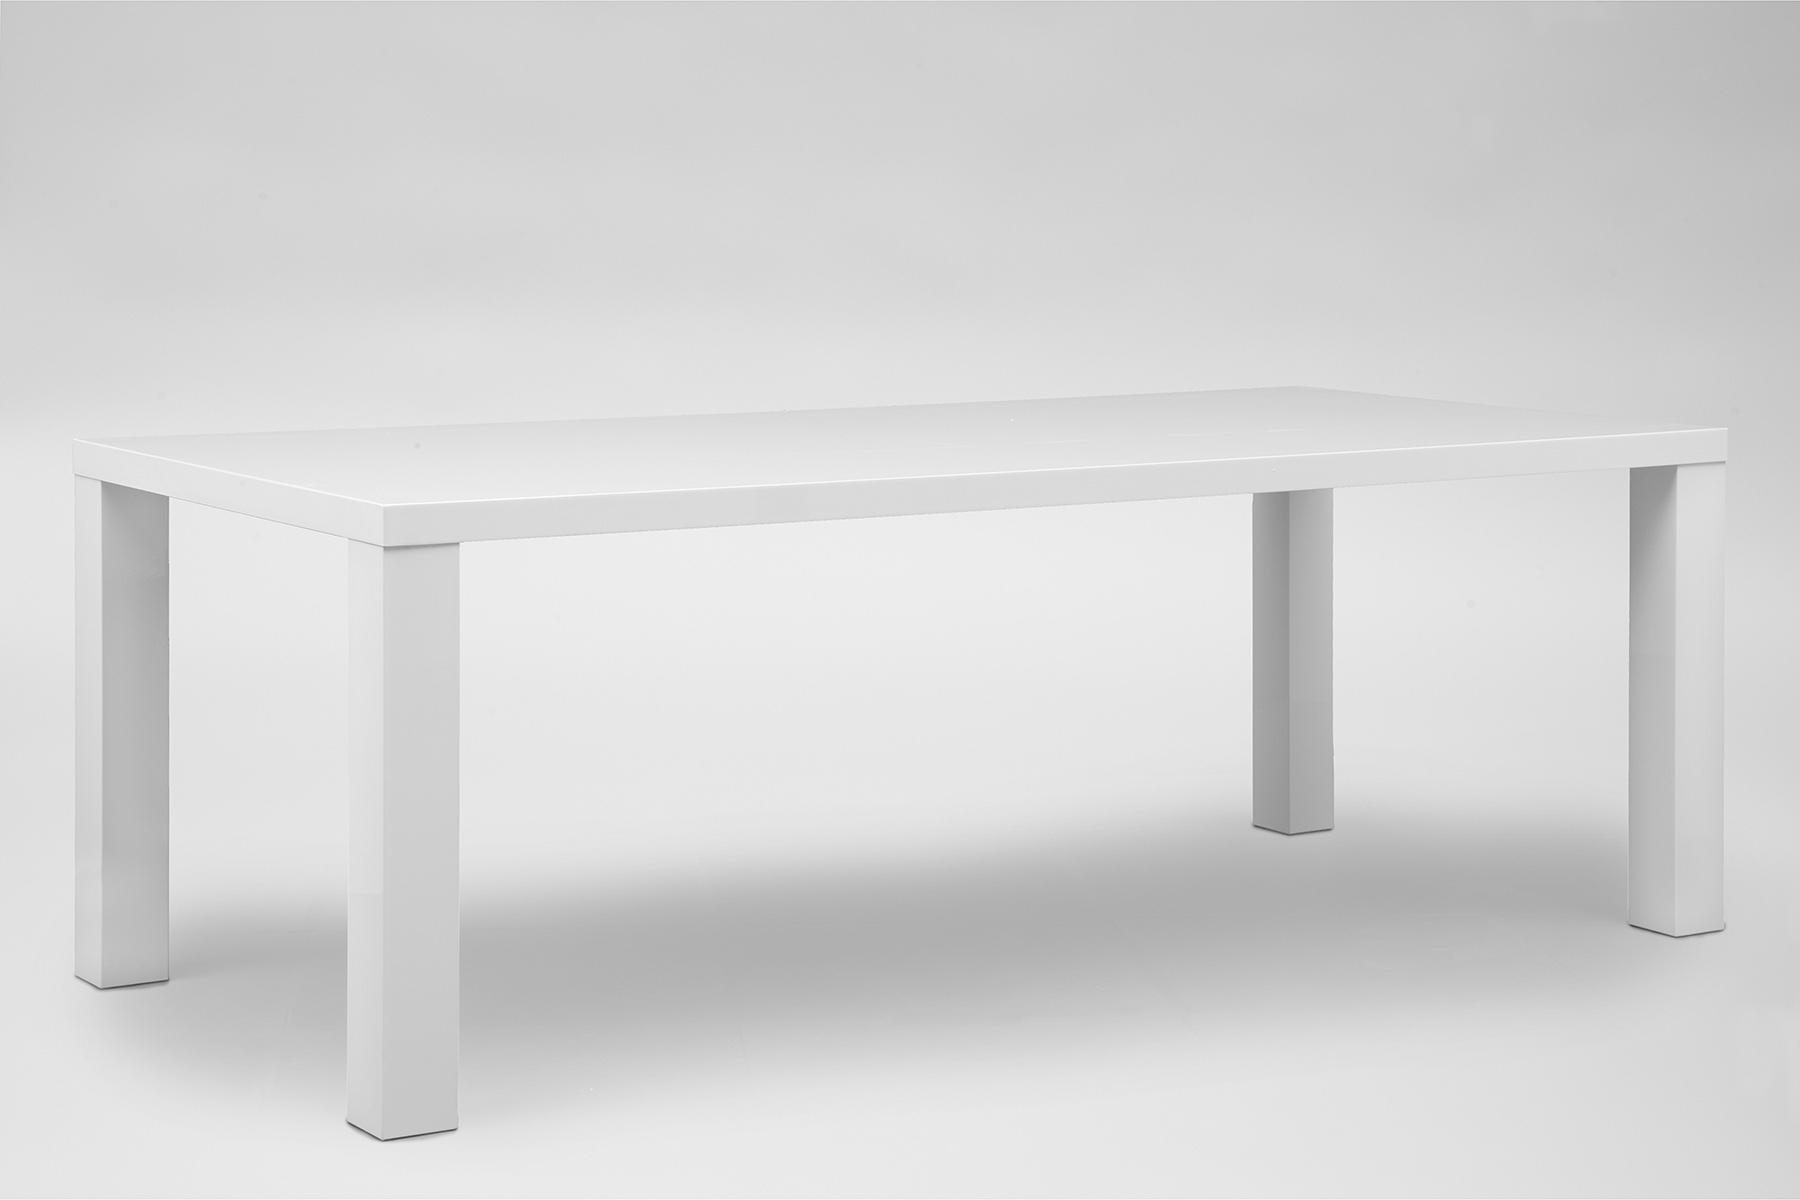 Hoogglans Keuken Krassen : 24designs Tafel High Gloss L220 X B100 X H76 5 Cm Wit Tafelblad Witte